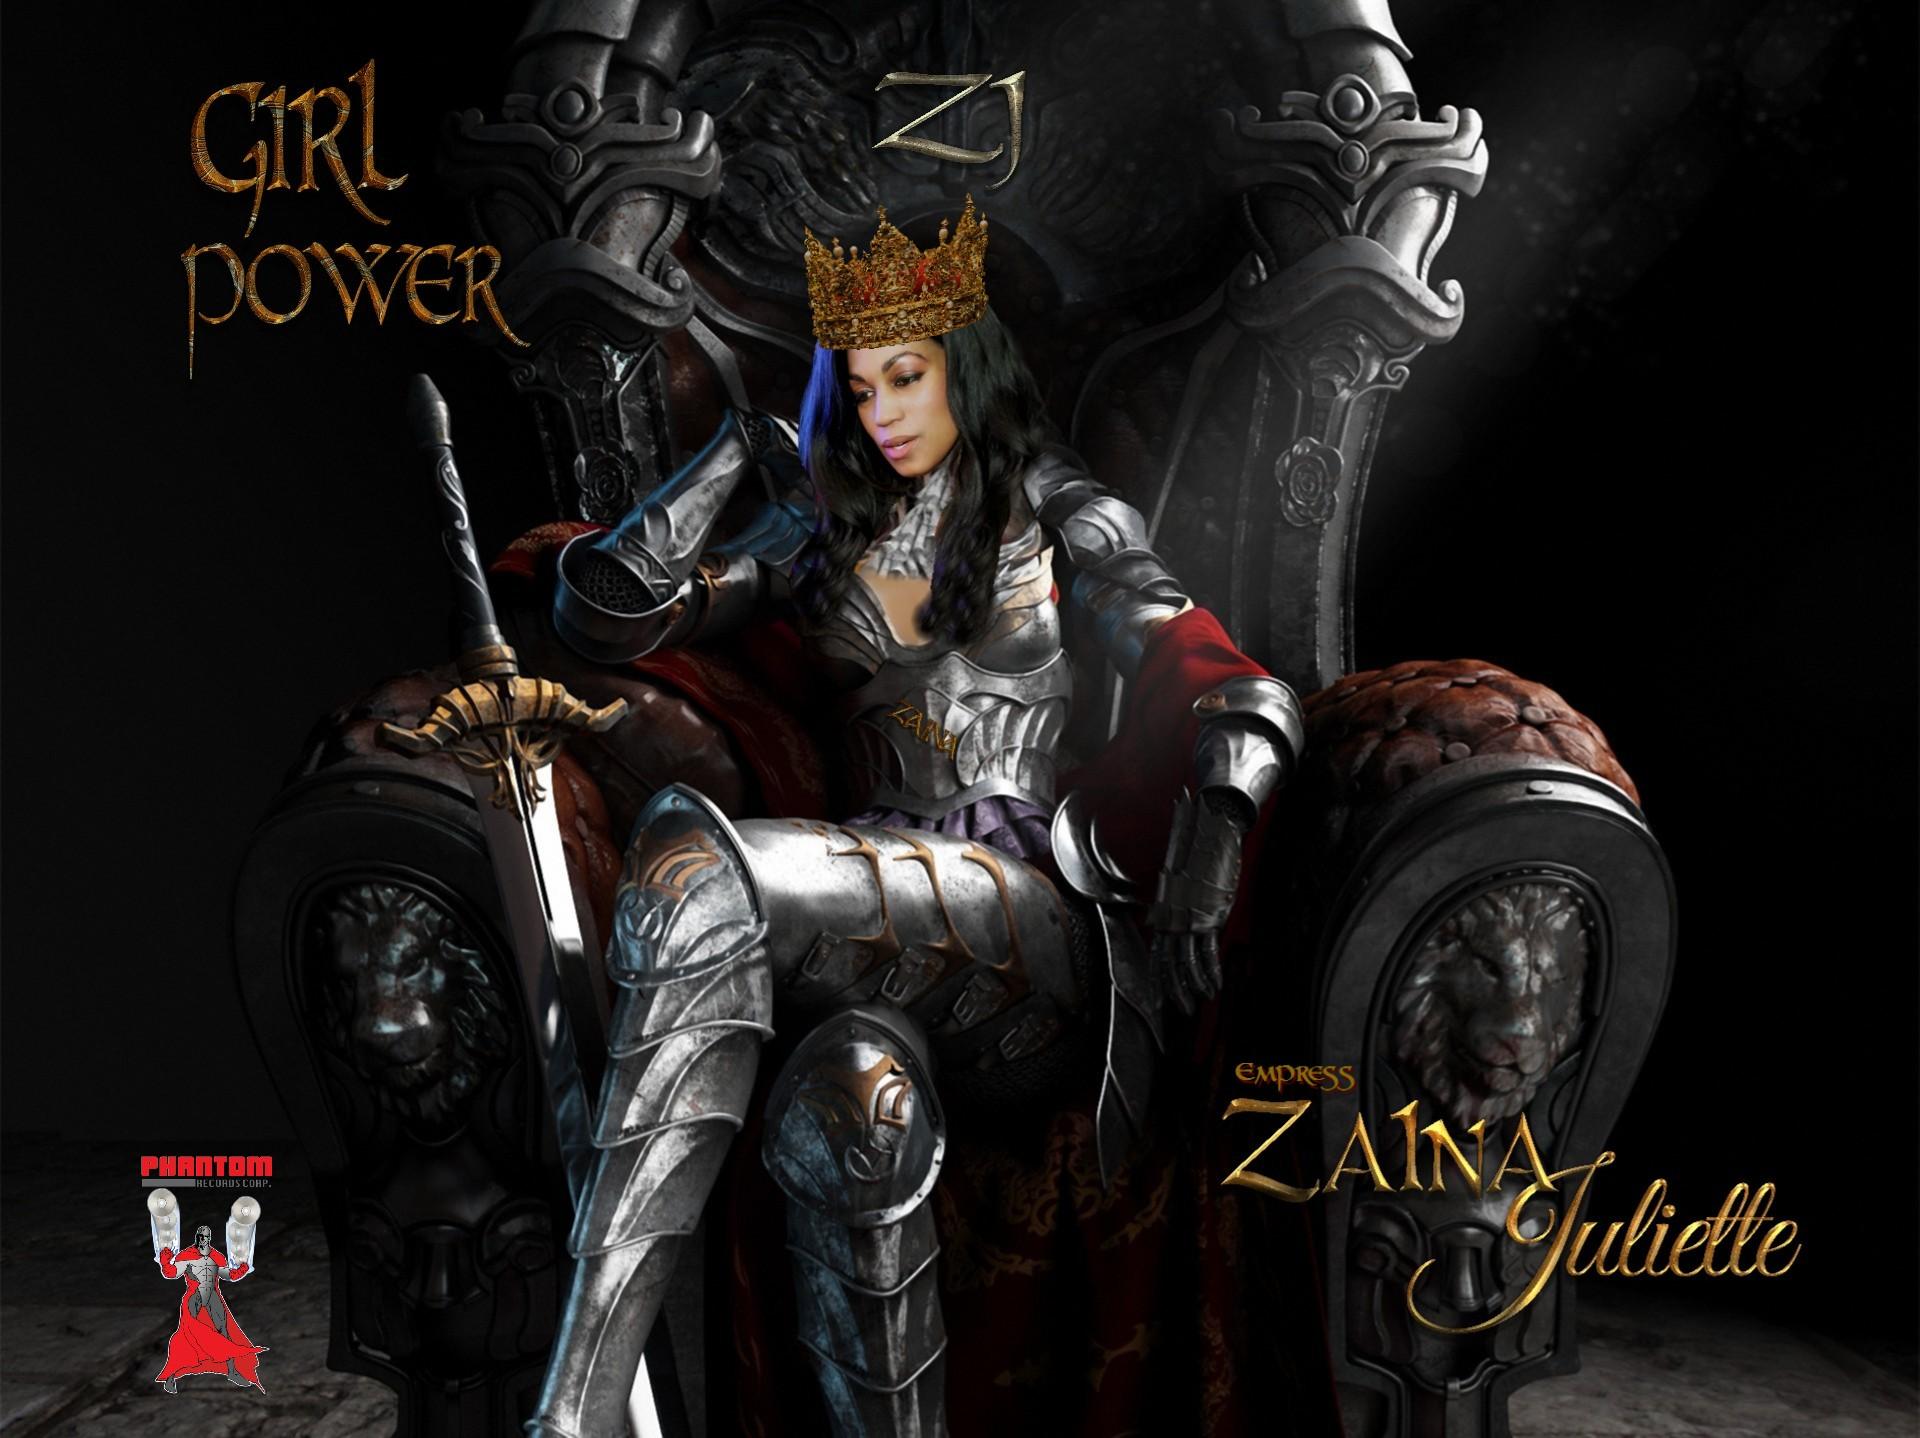 Zaina on new Throne 444t